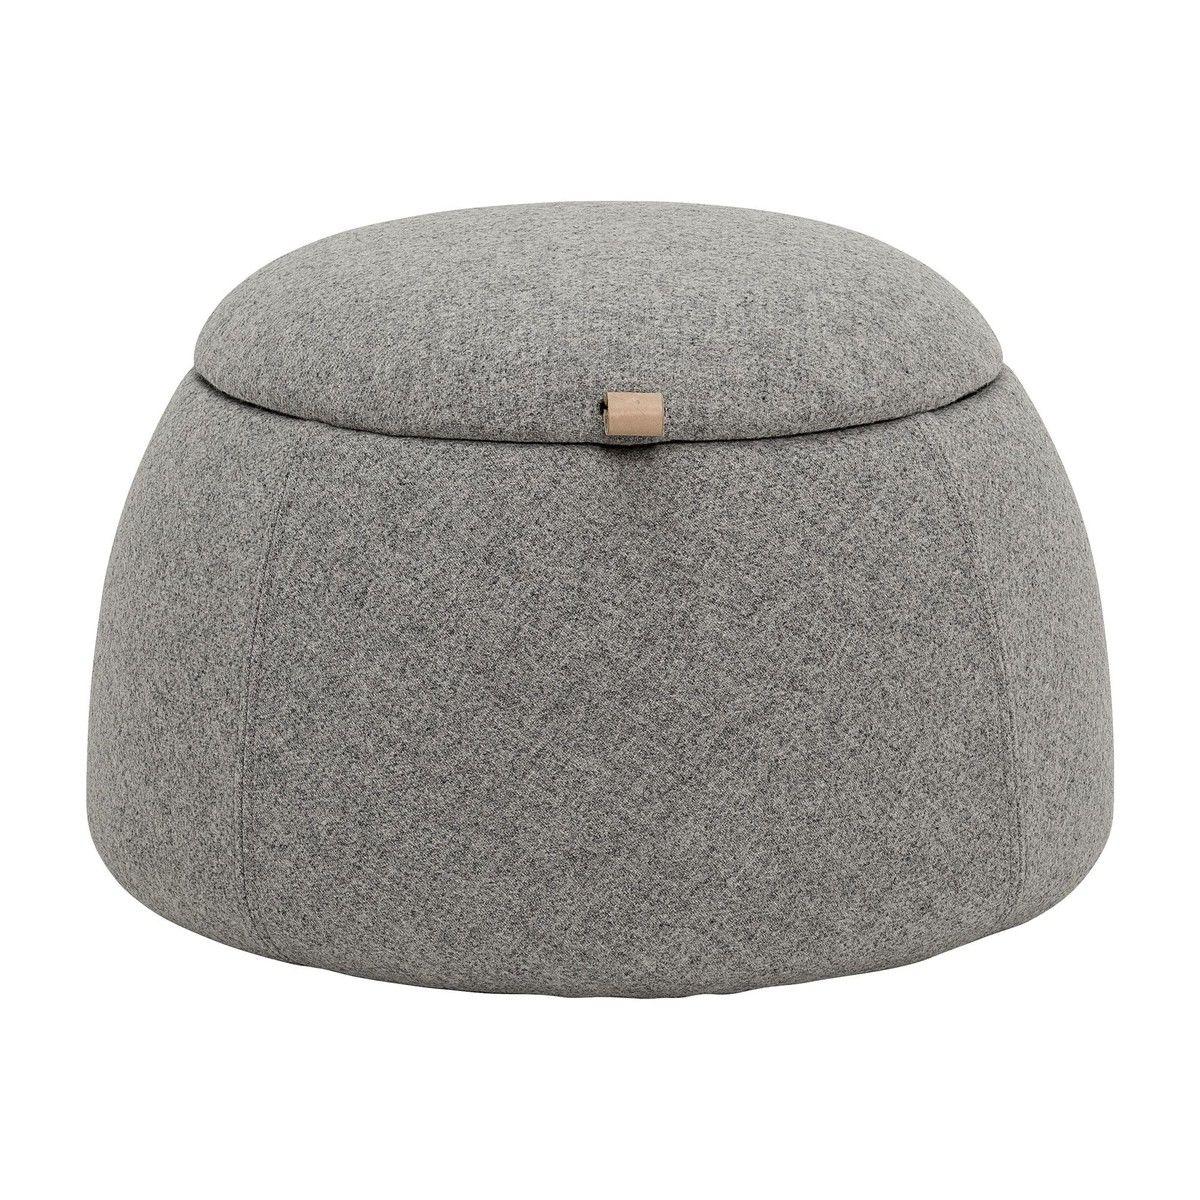 rock hocker mit stauraum bloomingville. Black Bedroom Furniture Sets. Home Design Ideas